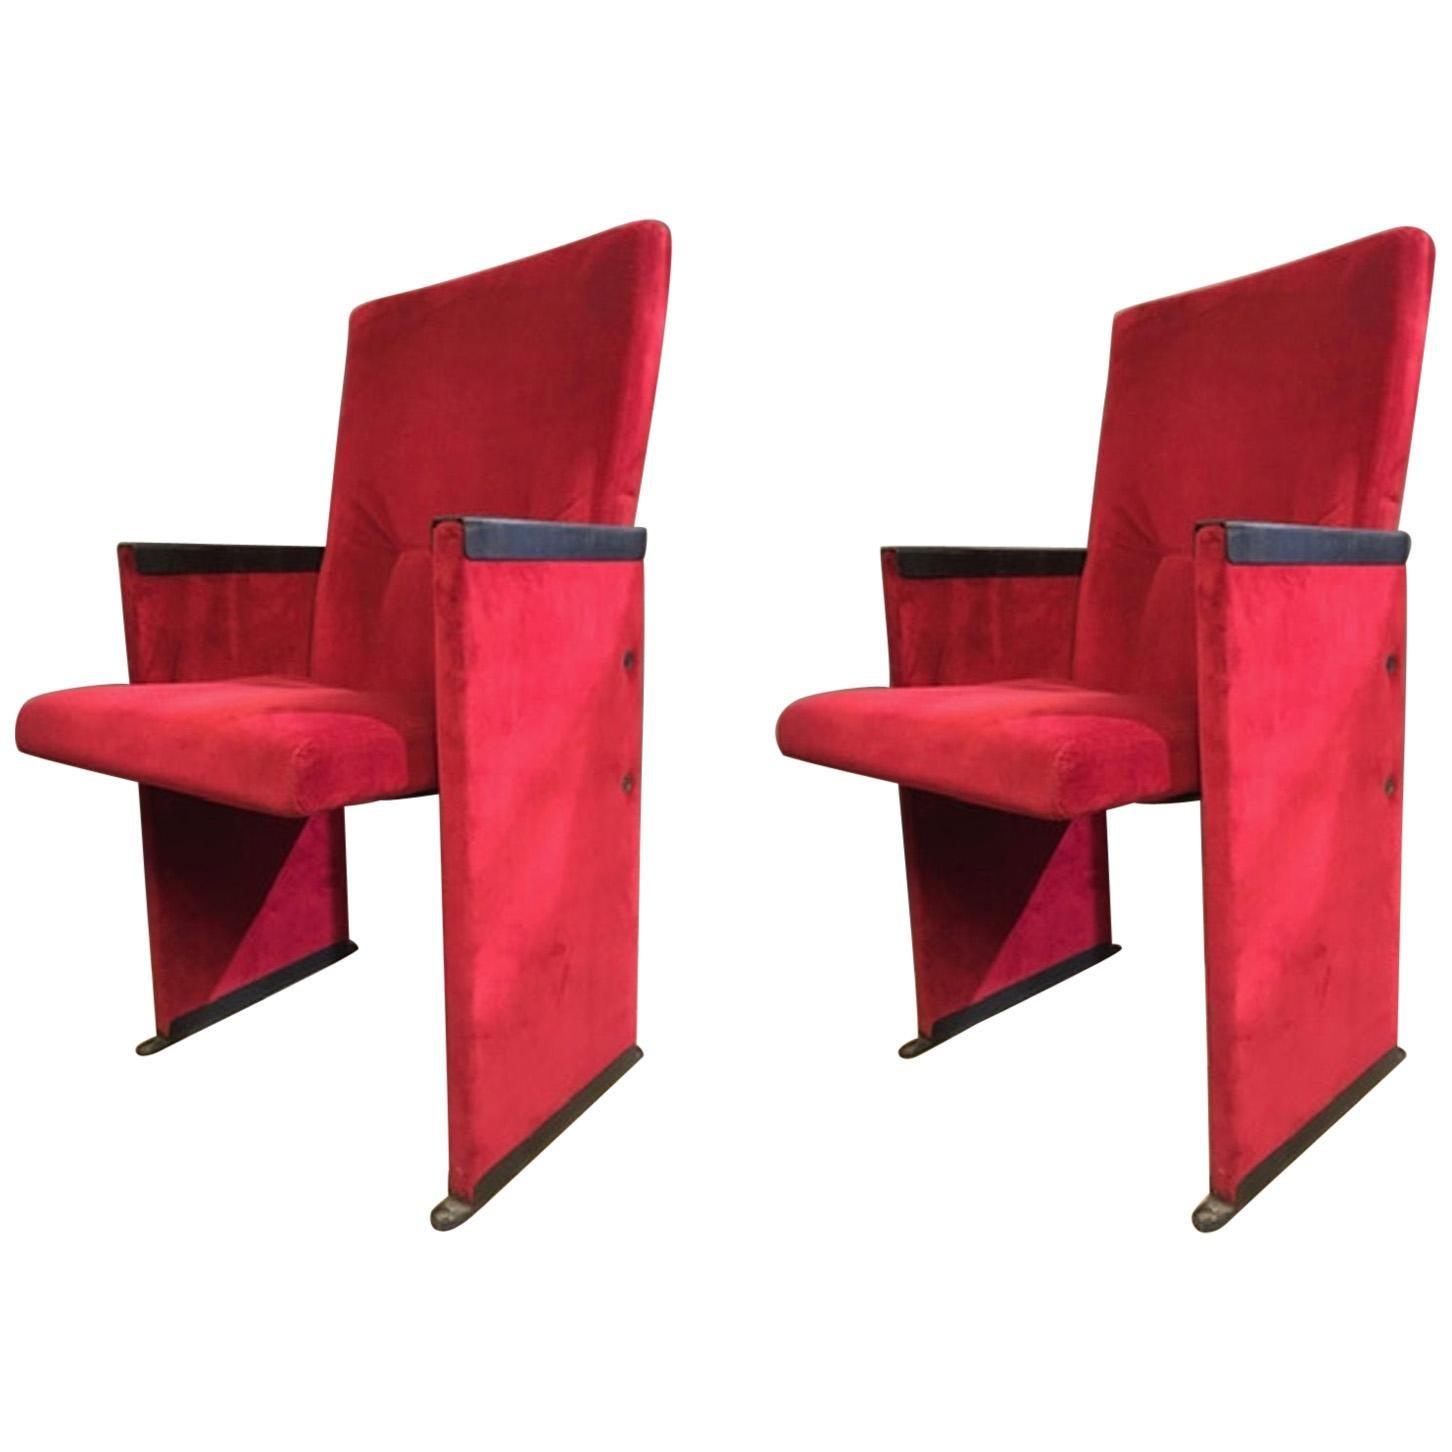 Italy 1960 Carlo Scarpa Design Pair of Red Velvet Armchairs for Auditorium